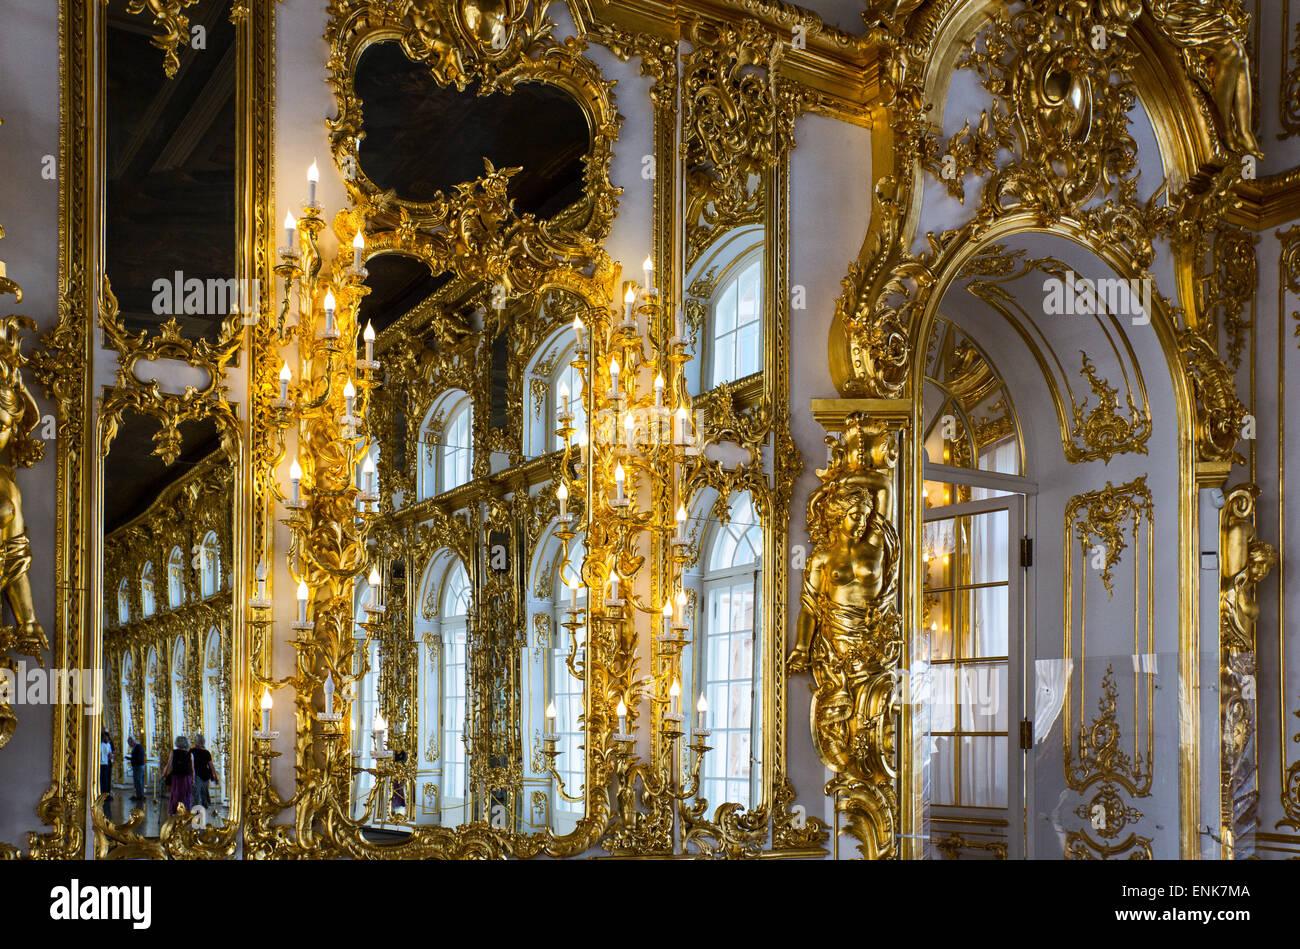 Russia, St.Petersburg, Pushkin, Tsarkoje Selo, the beautiful interiors of the Catherine Palace - Stock Image